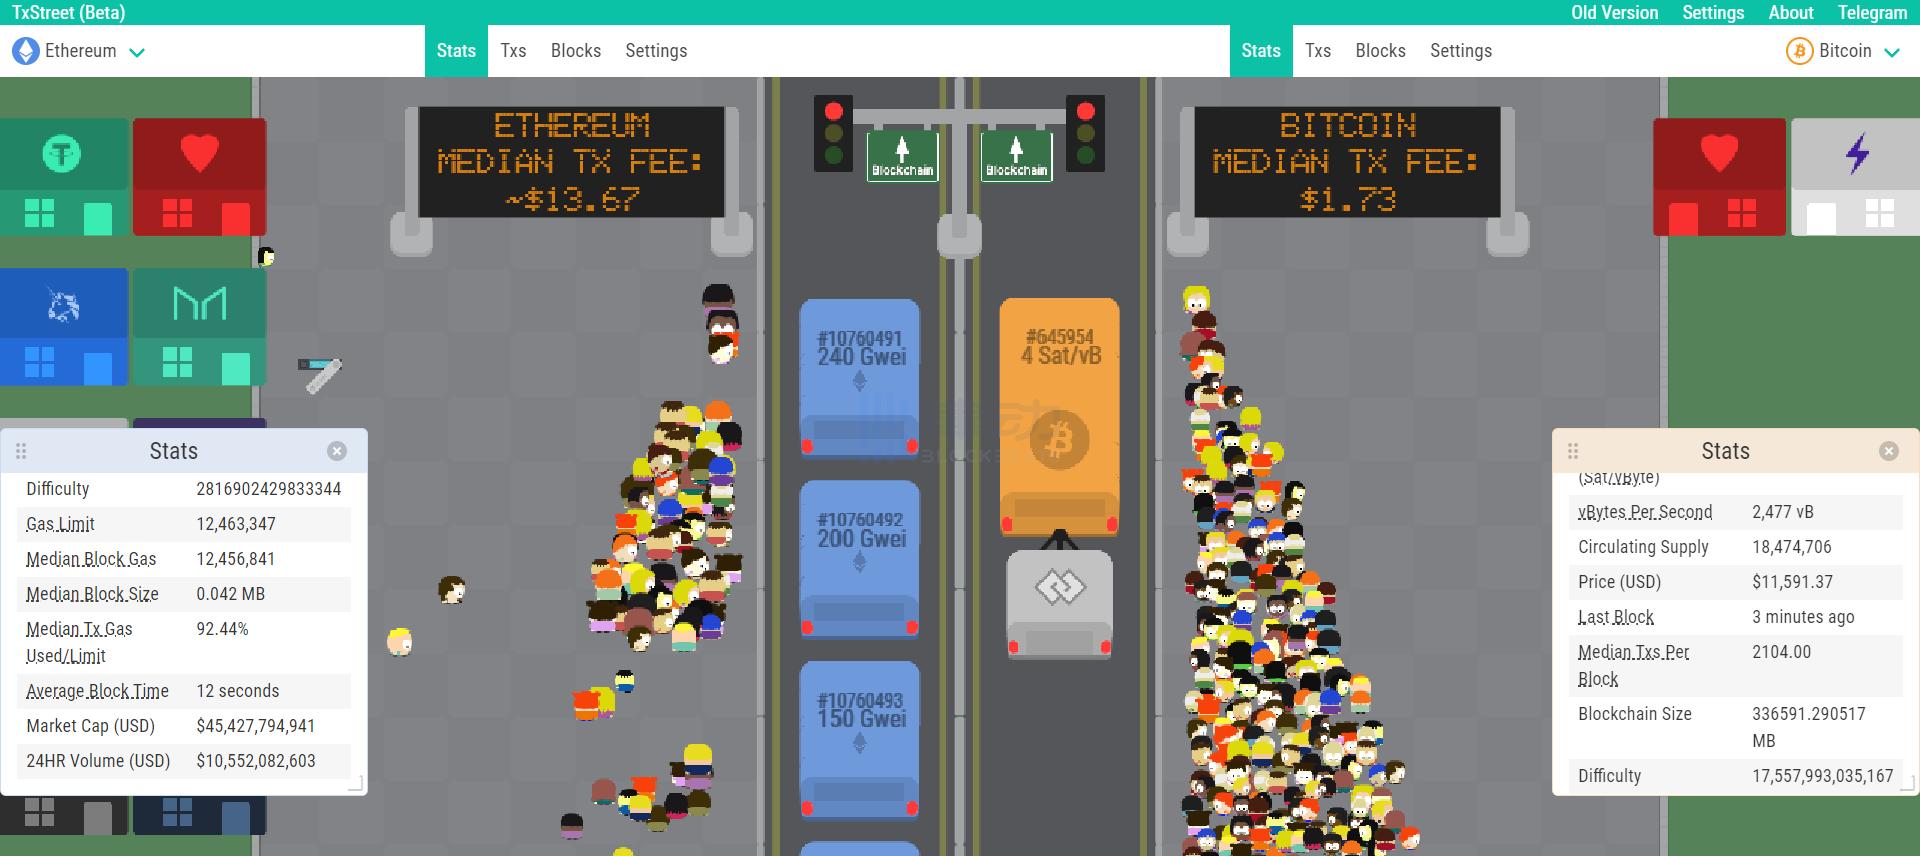 TxStreet:一个获得 V 神喜爱的加密数据可视化网站